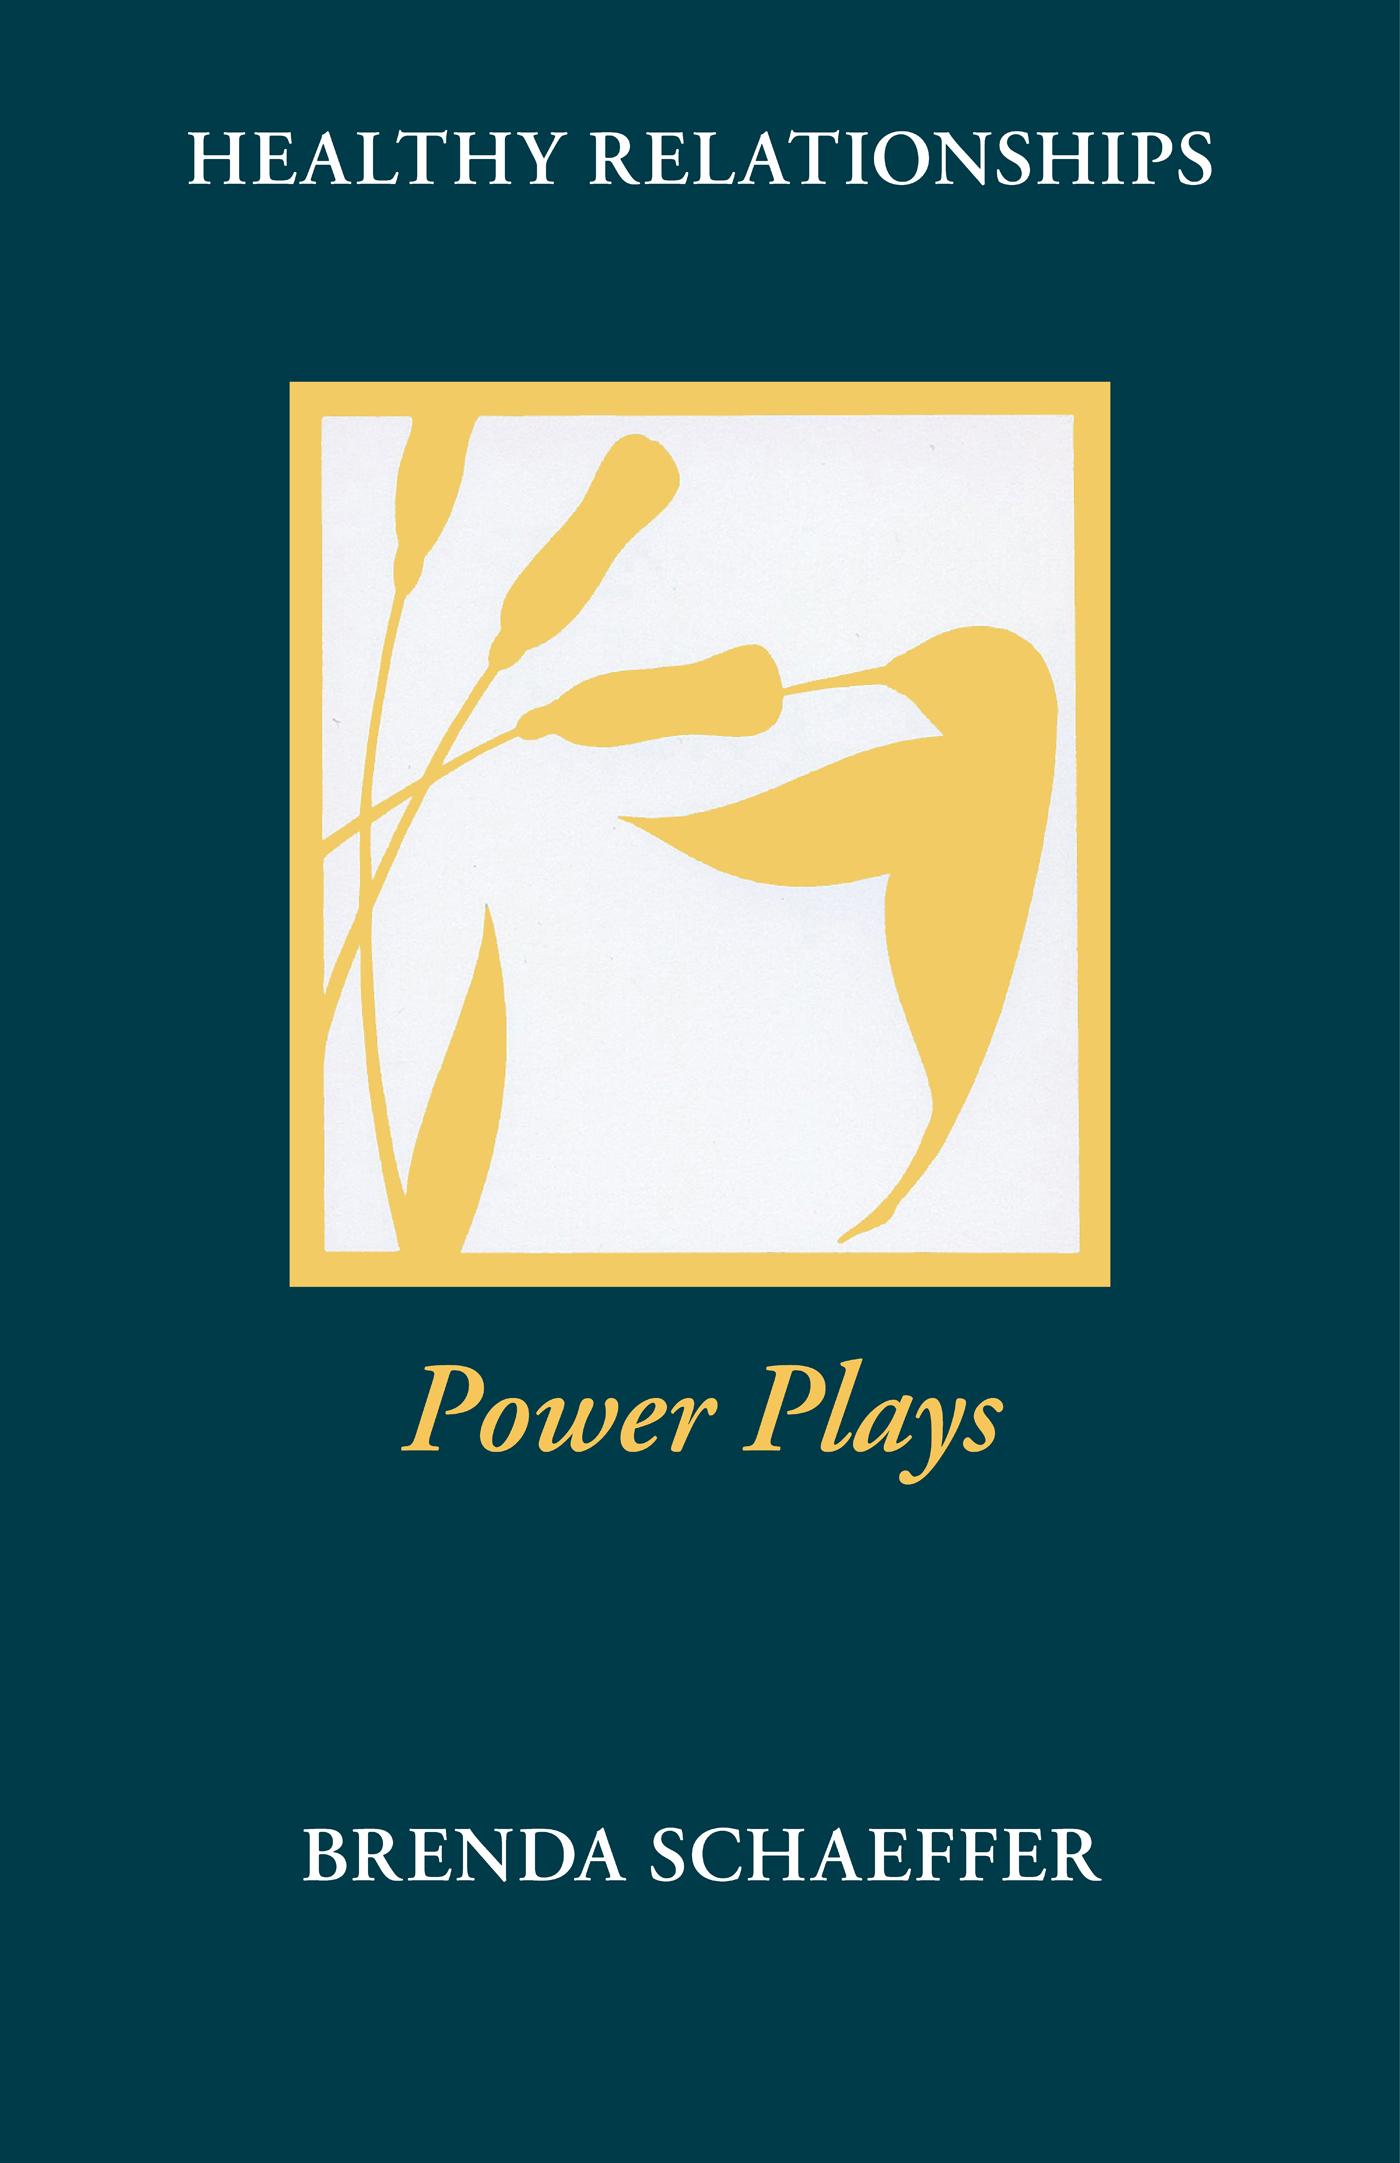 power plays cover.jpg